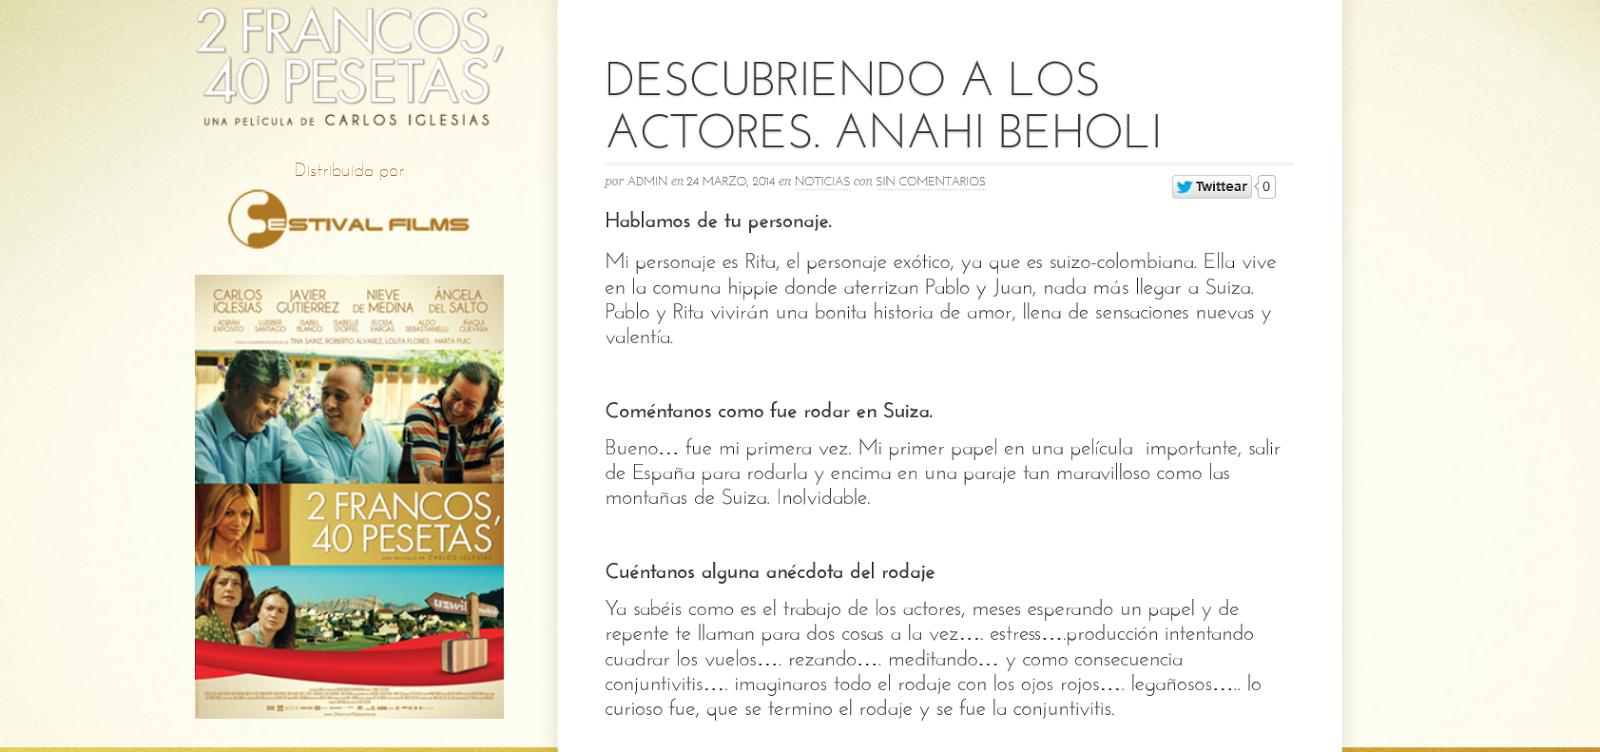 http://www.2francos40pesetas.es/